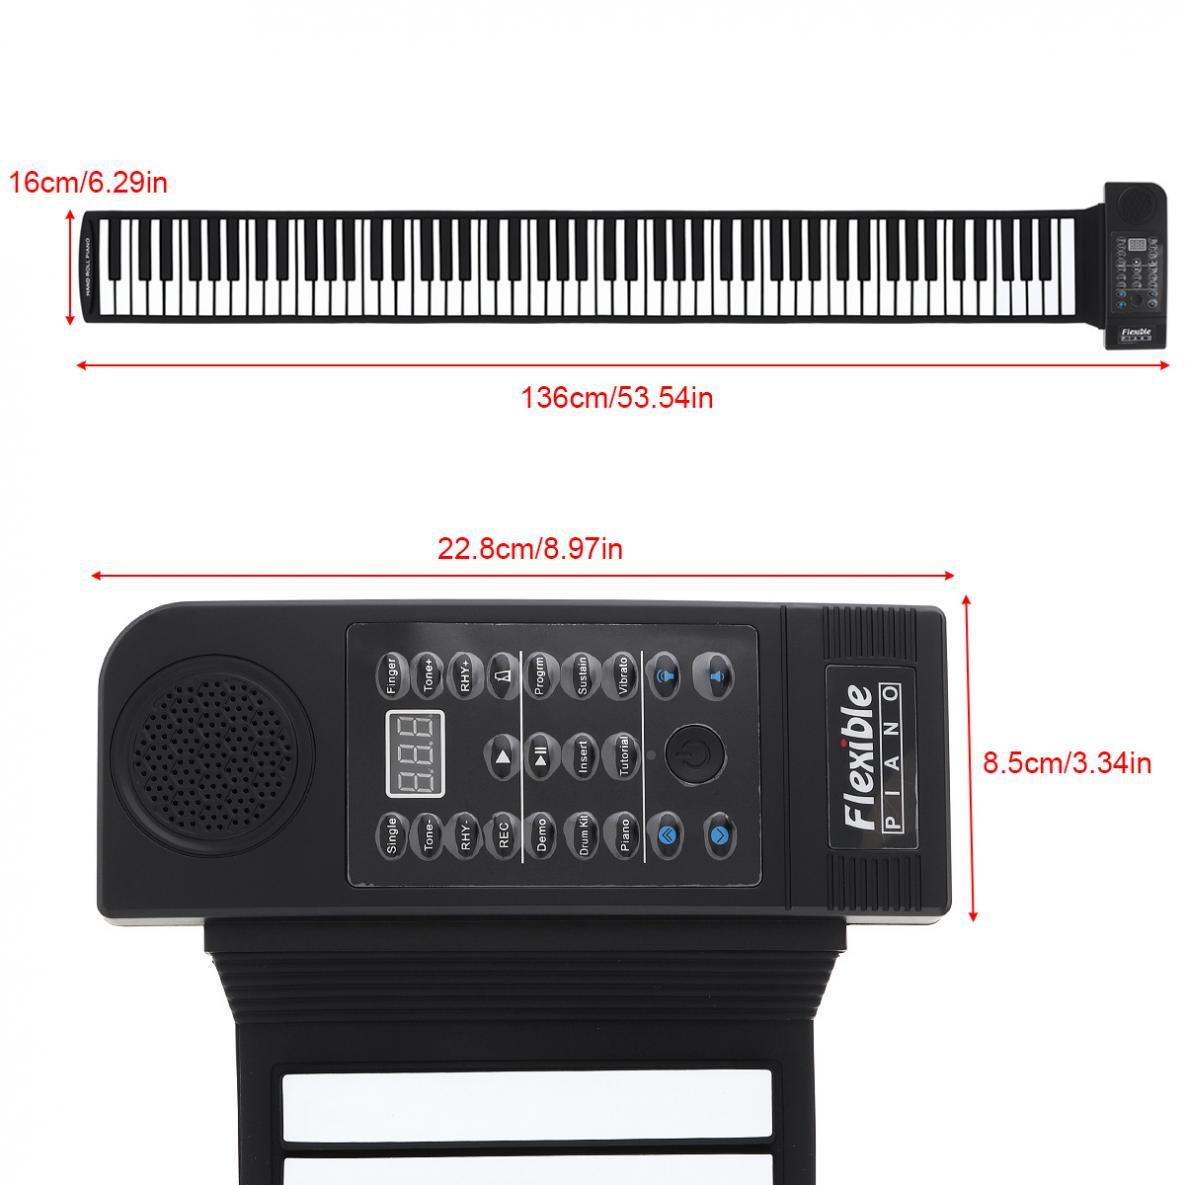 KONIX PU88M 88 Keys MIDI 128 Tones Electronic Organ Roll Up Folding Piano Built-in Speaker for Kids beginners /  Performance enlarge